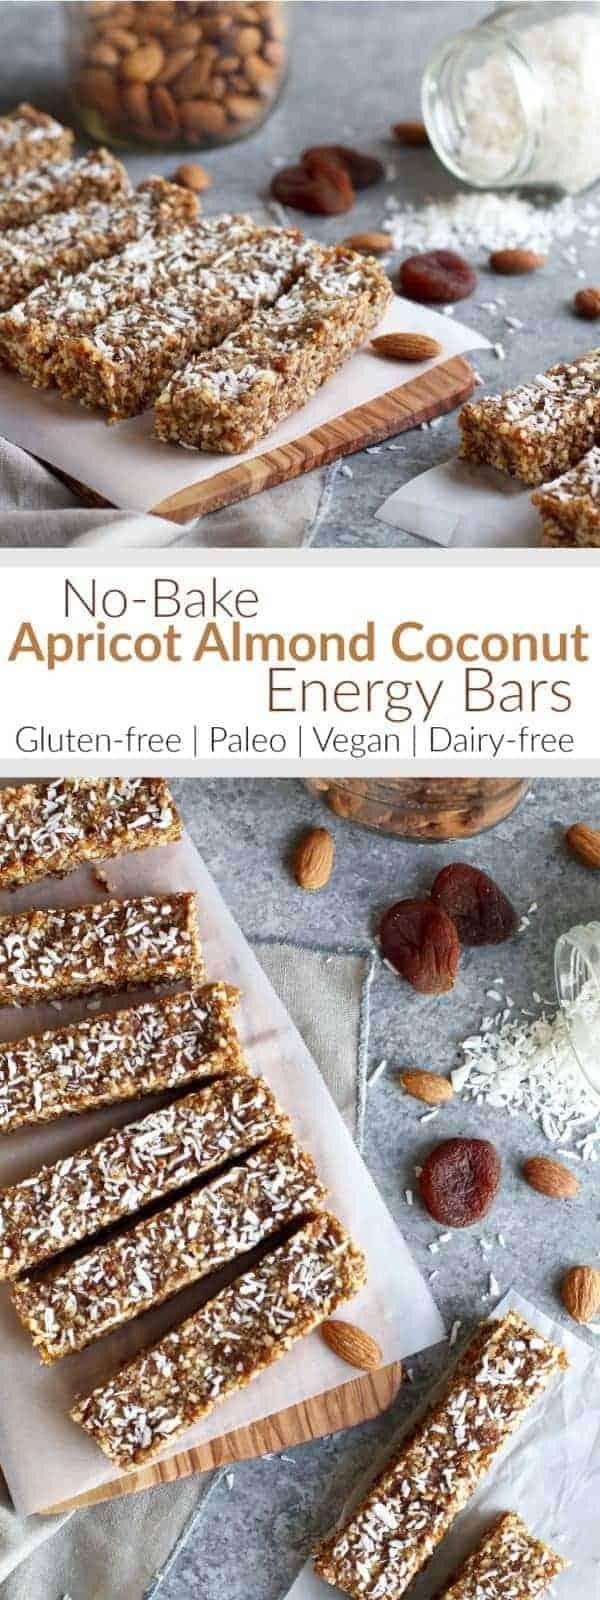 Pinterest image for Apricot Almond Coconut Energy Bars